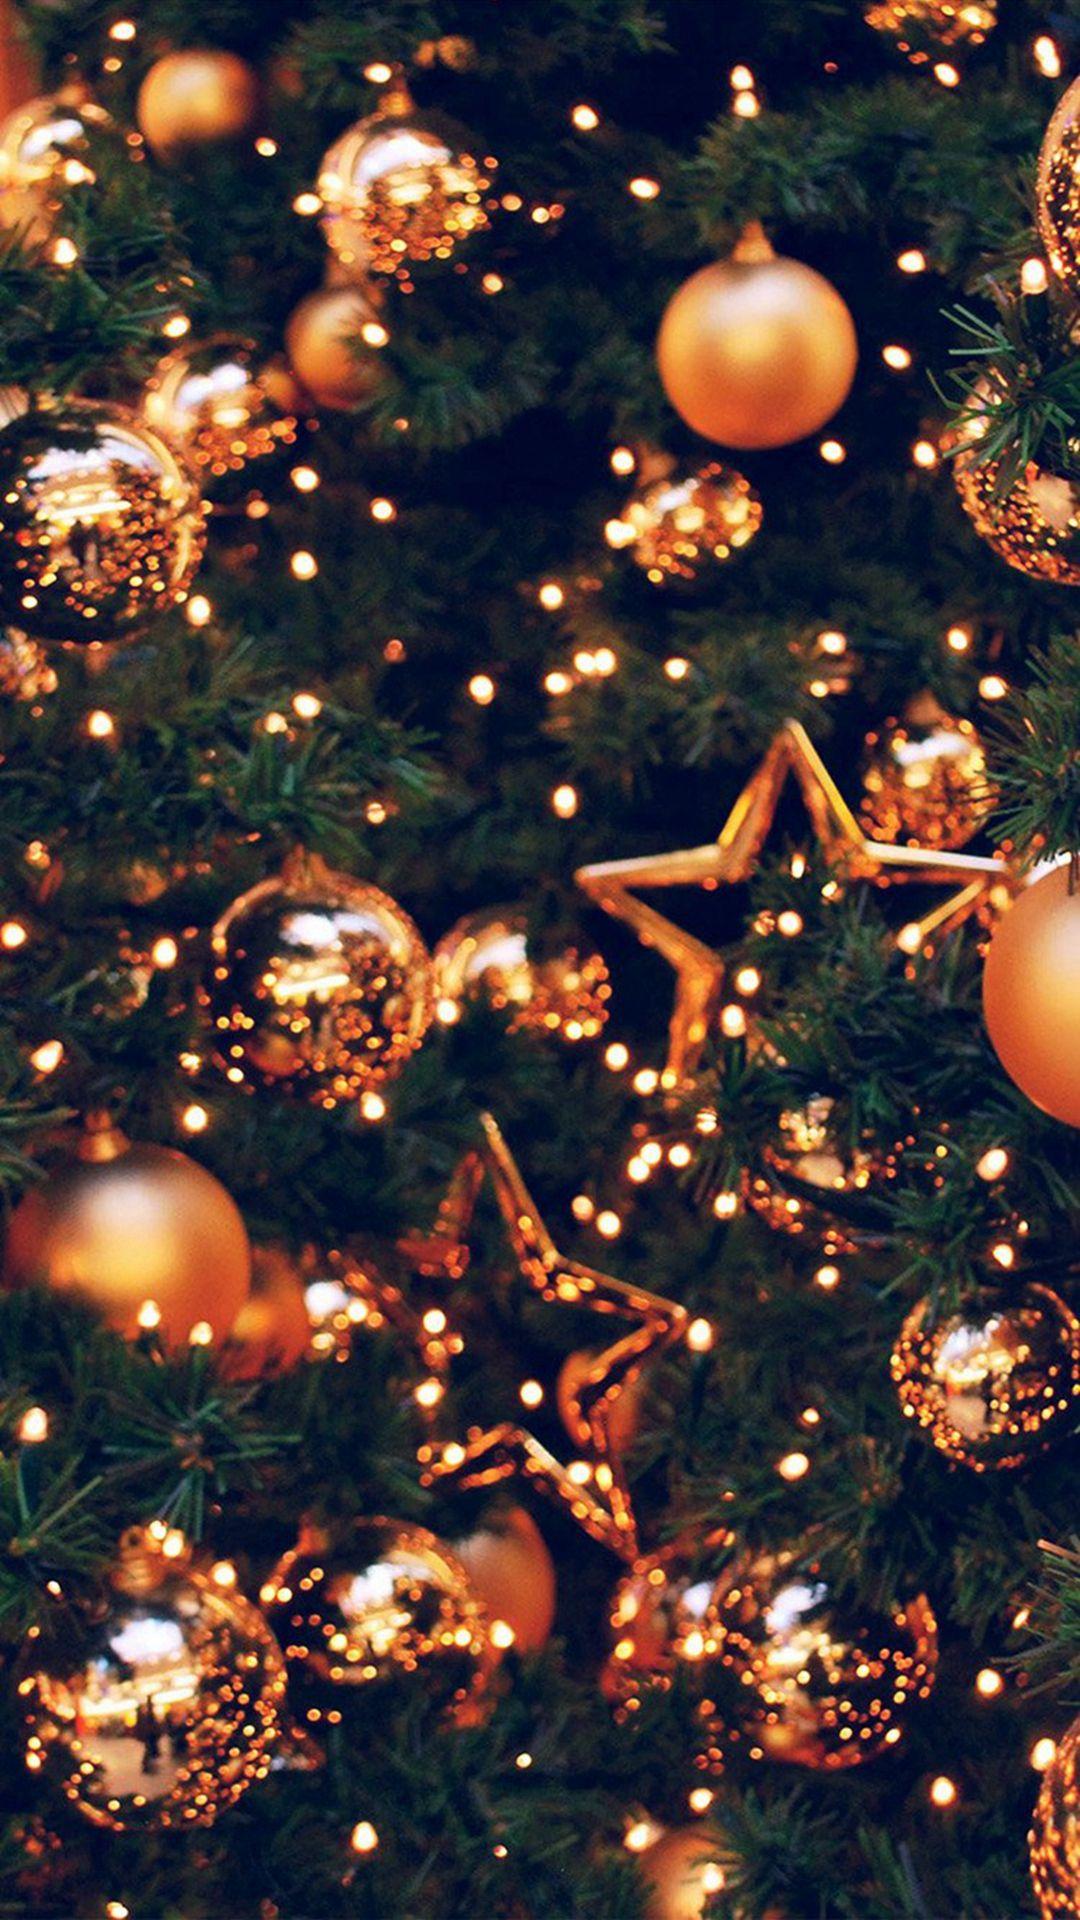 Decoration Holiday Christmas Illustration Art Gold iPhone